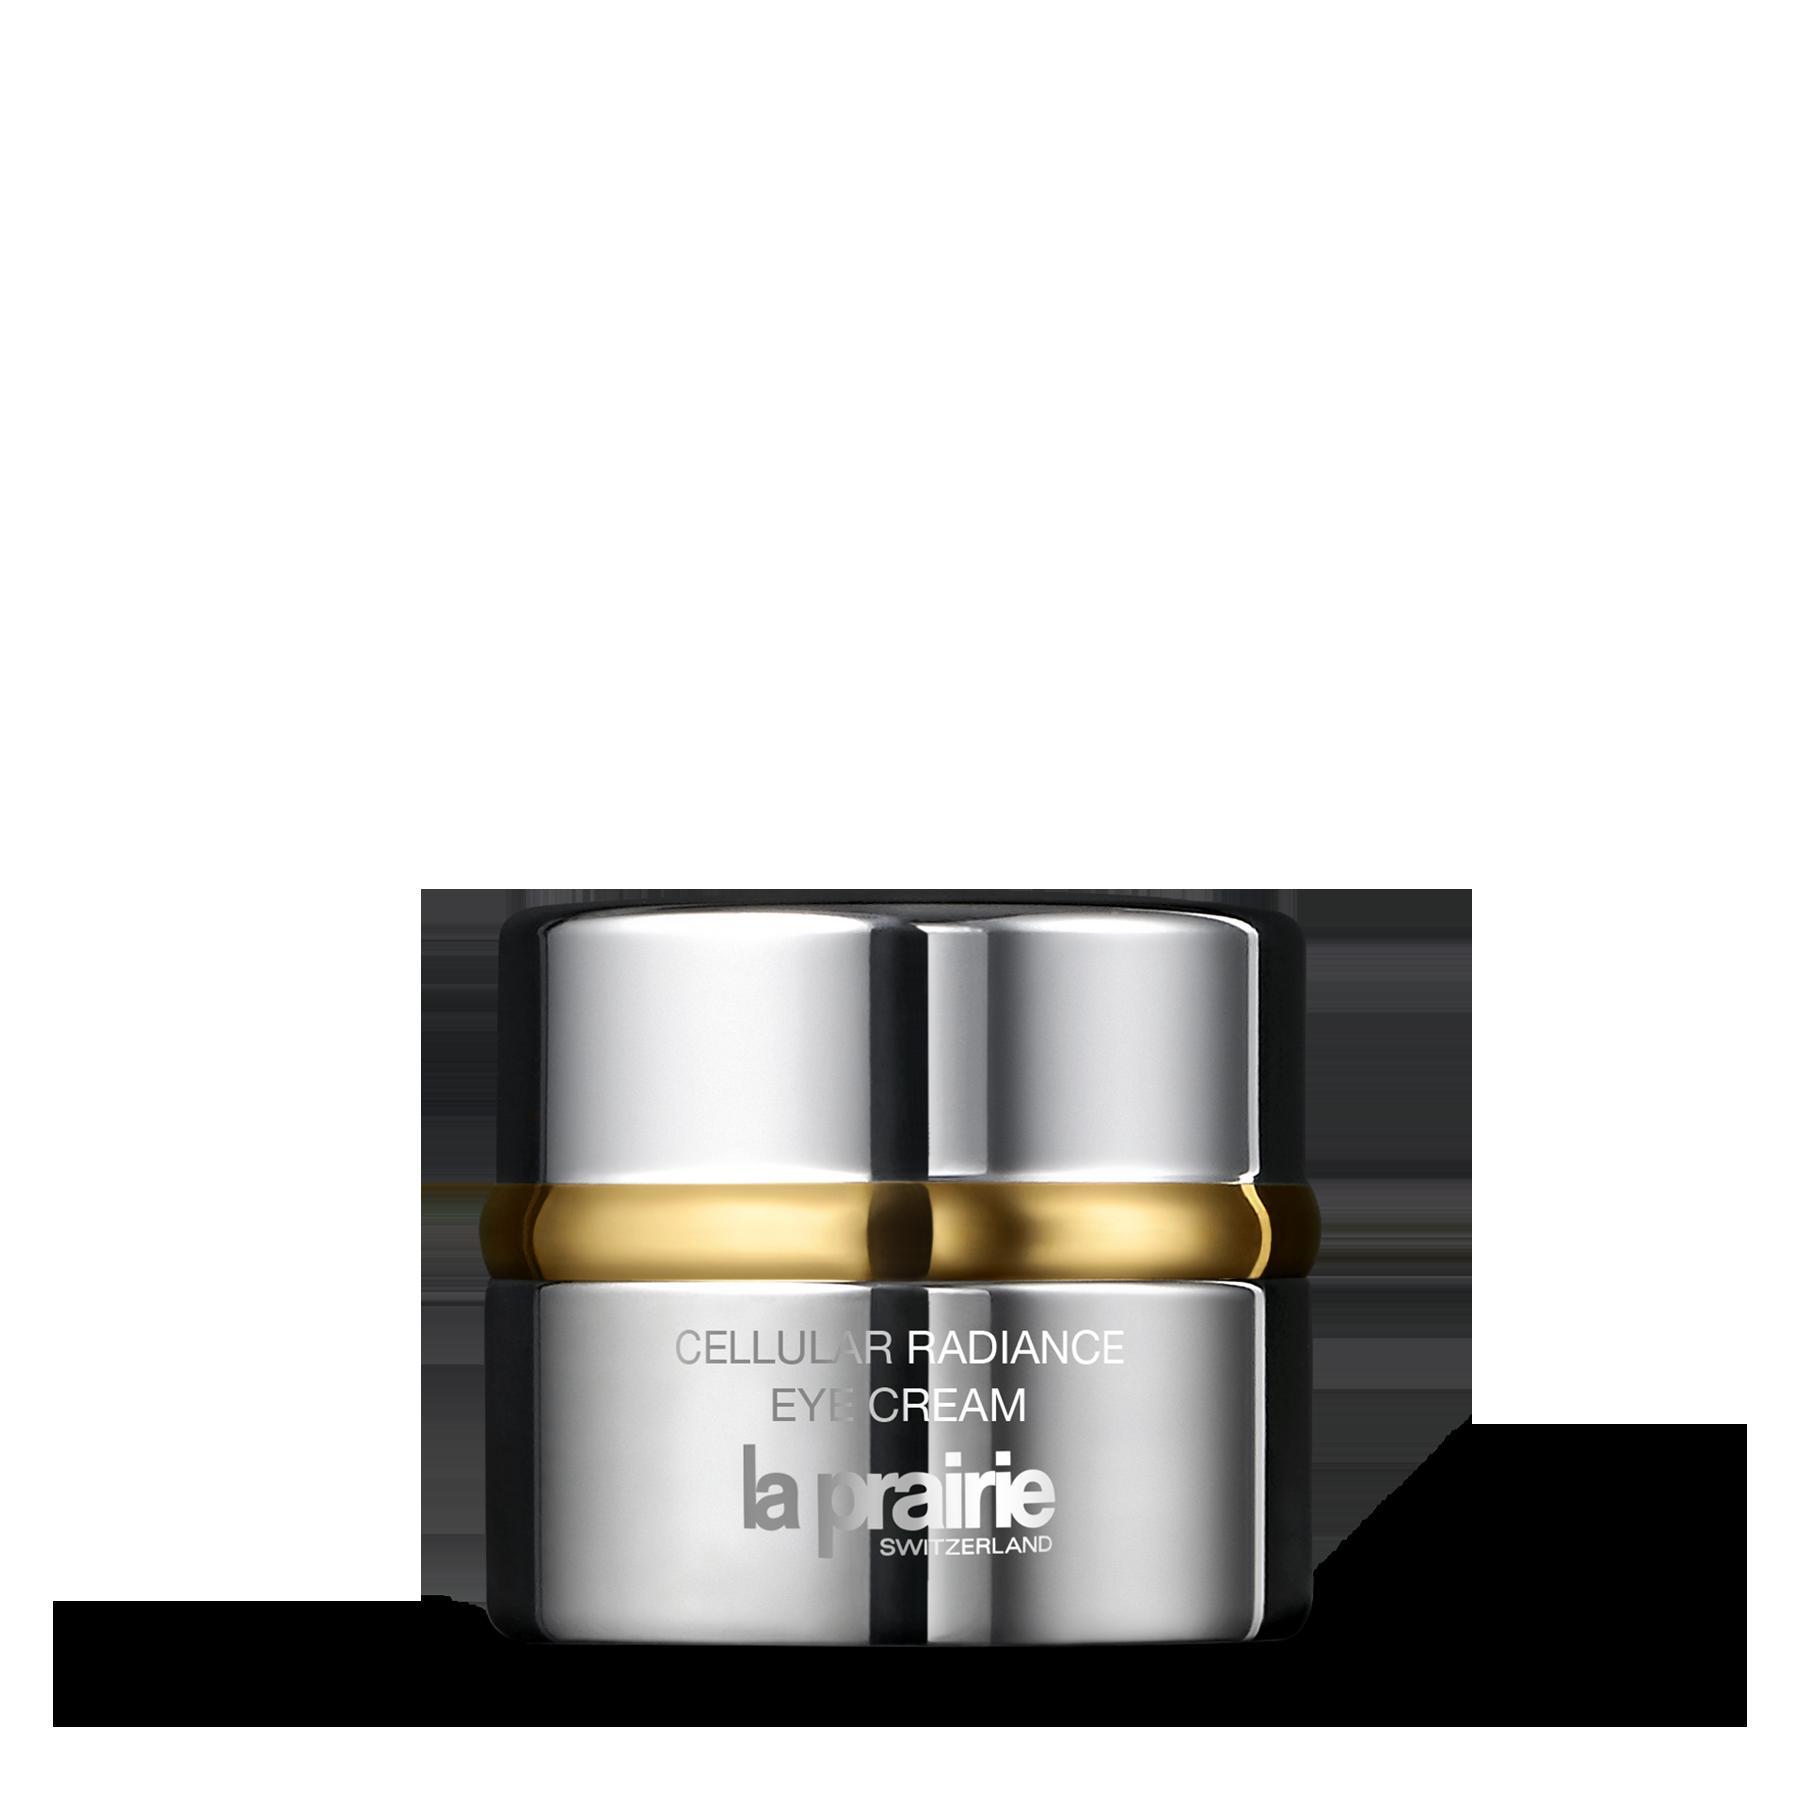 Radiance Cellular Eye Cream | Eye cream | La Prairie